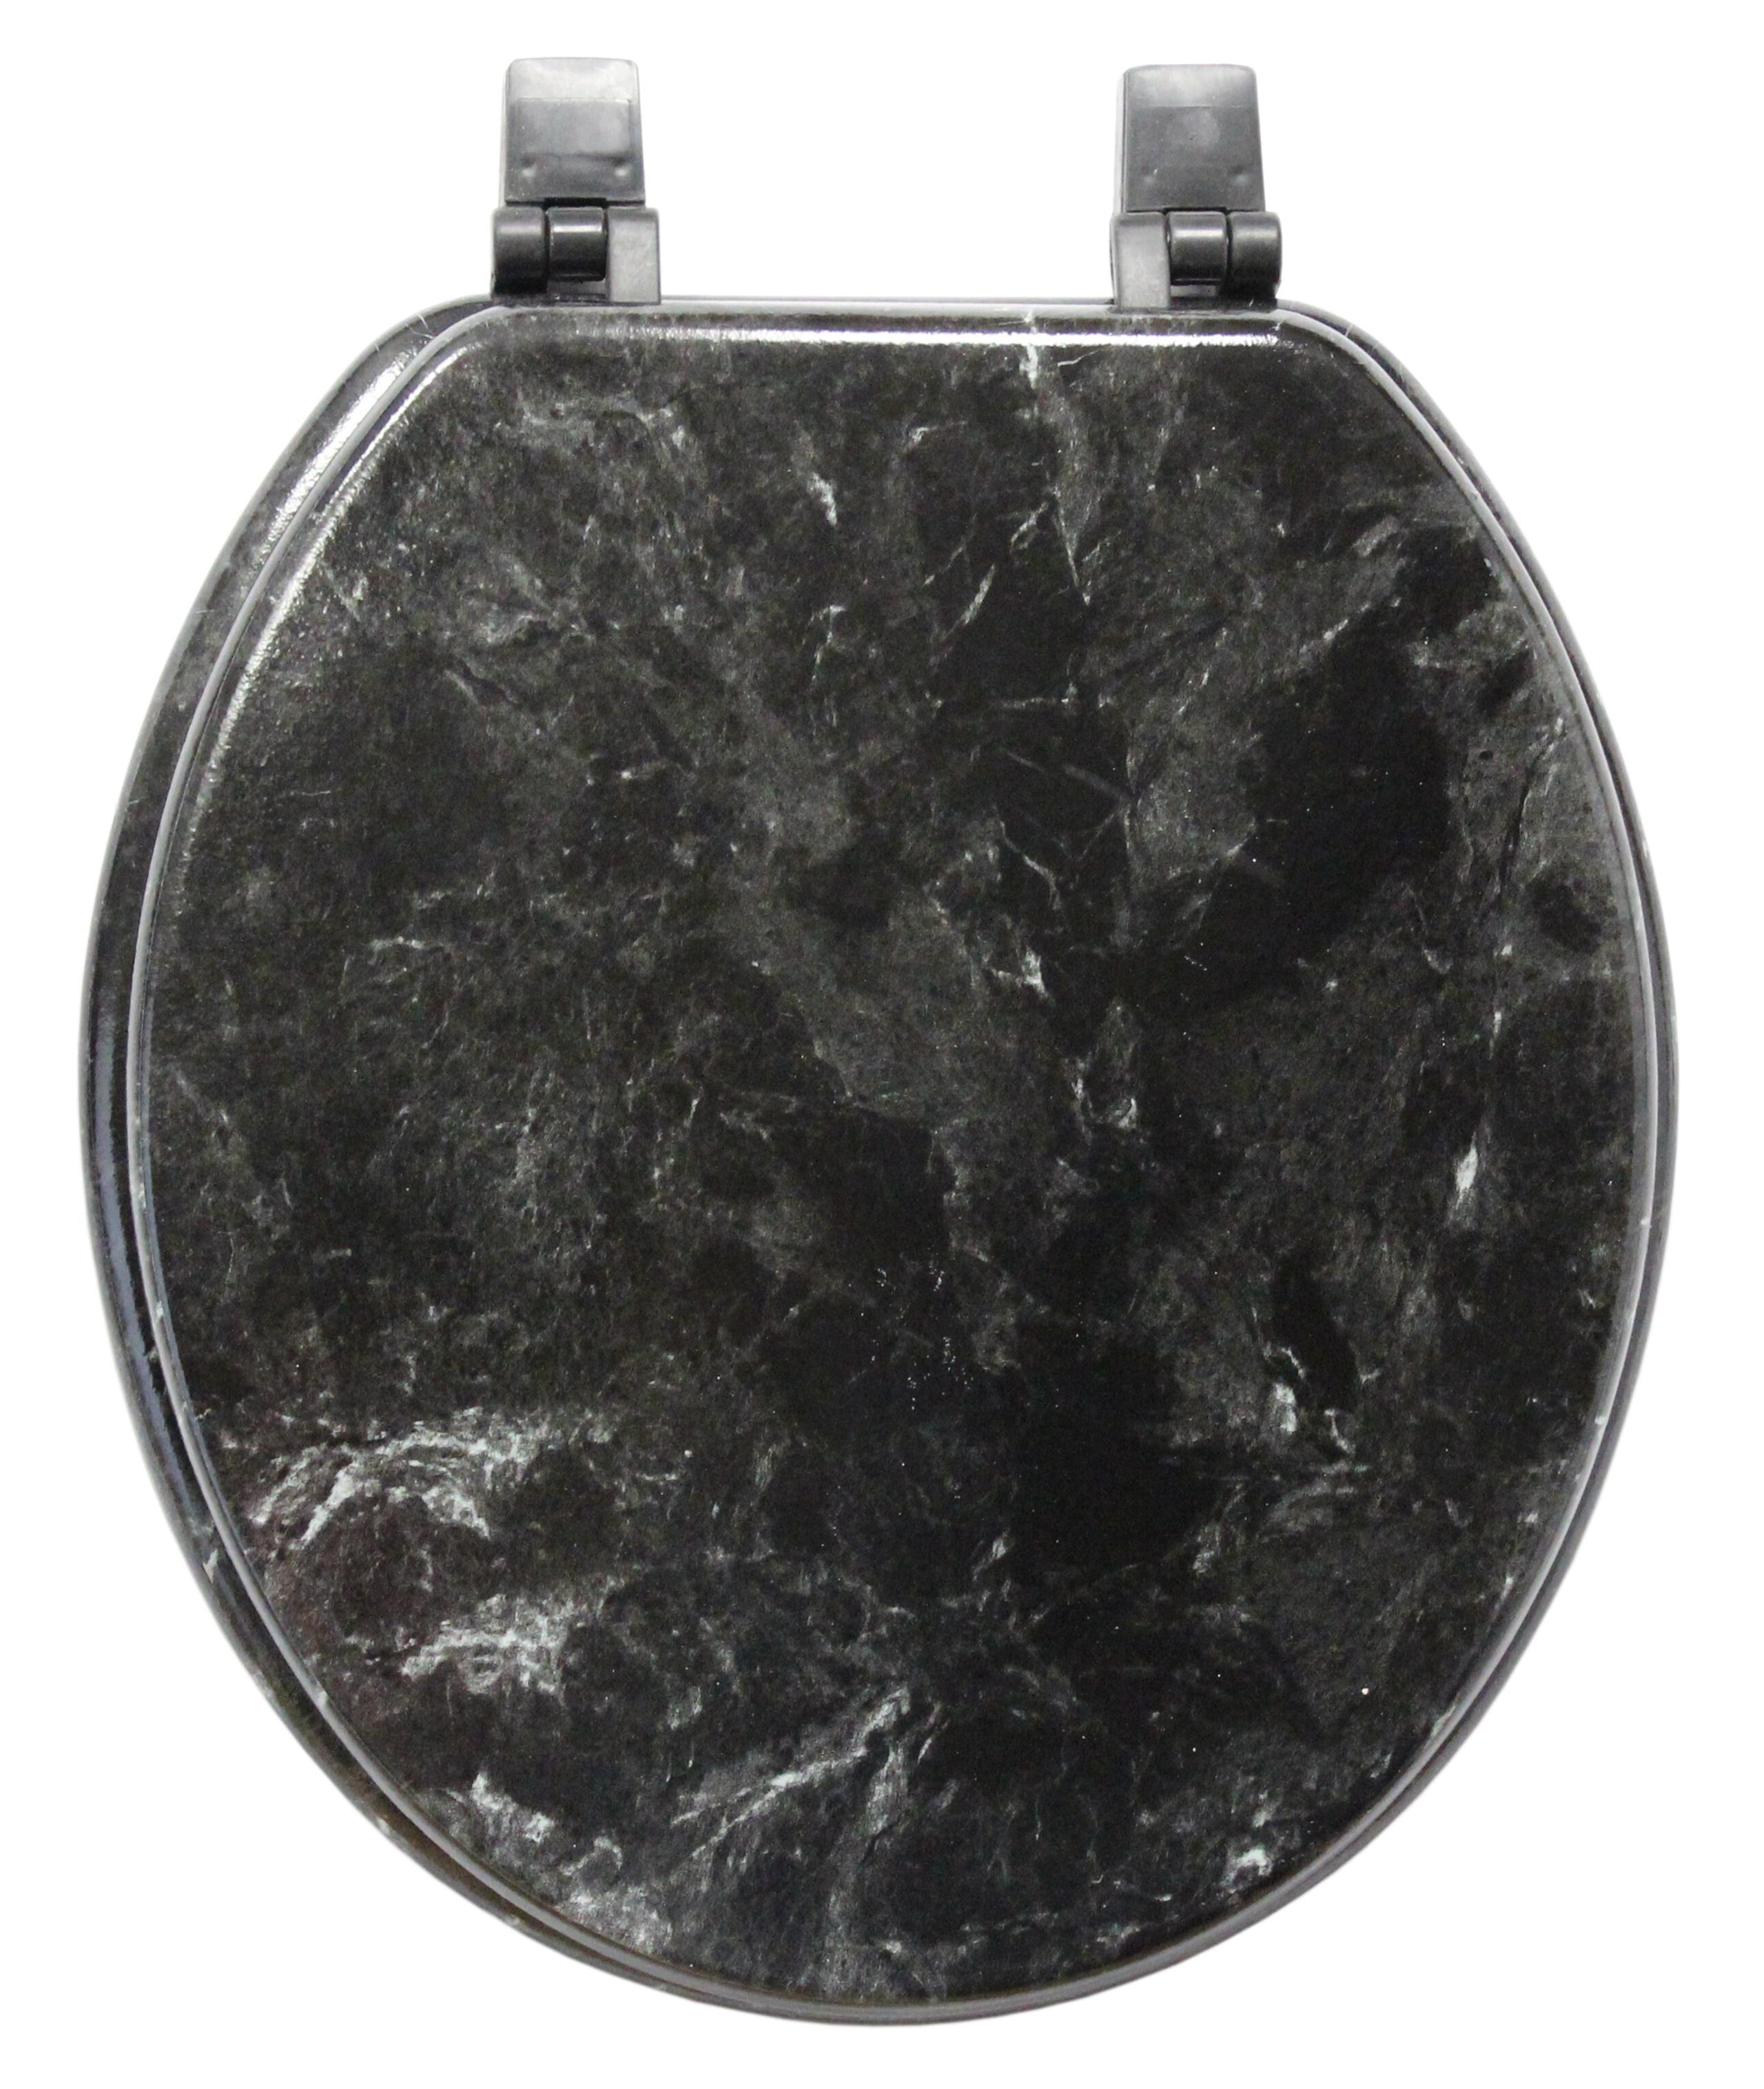 Marble Toilet Seat Ideas On Foter